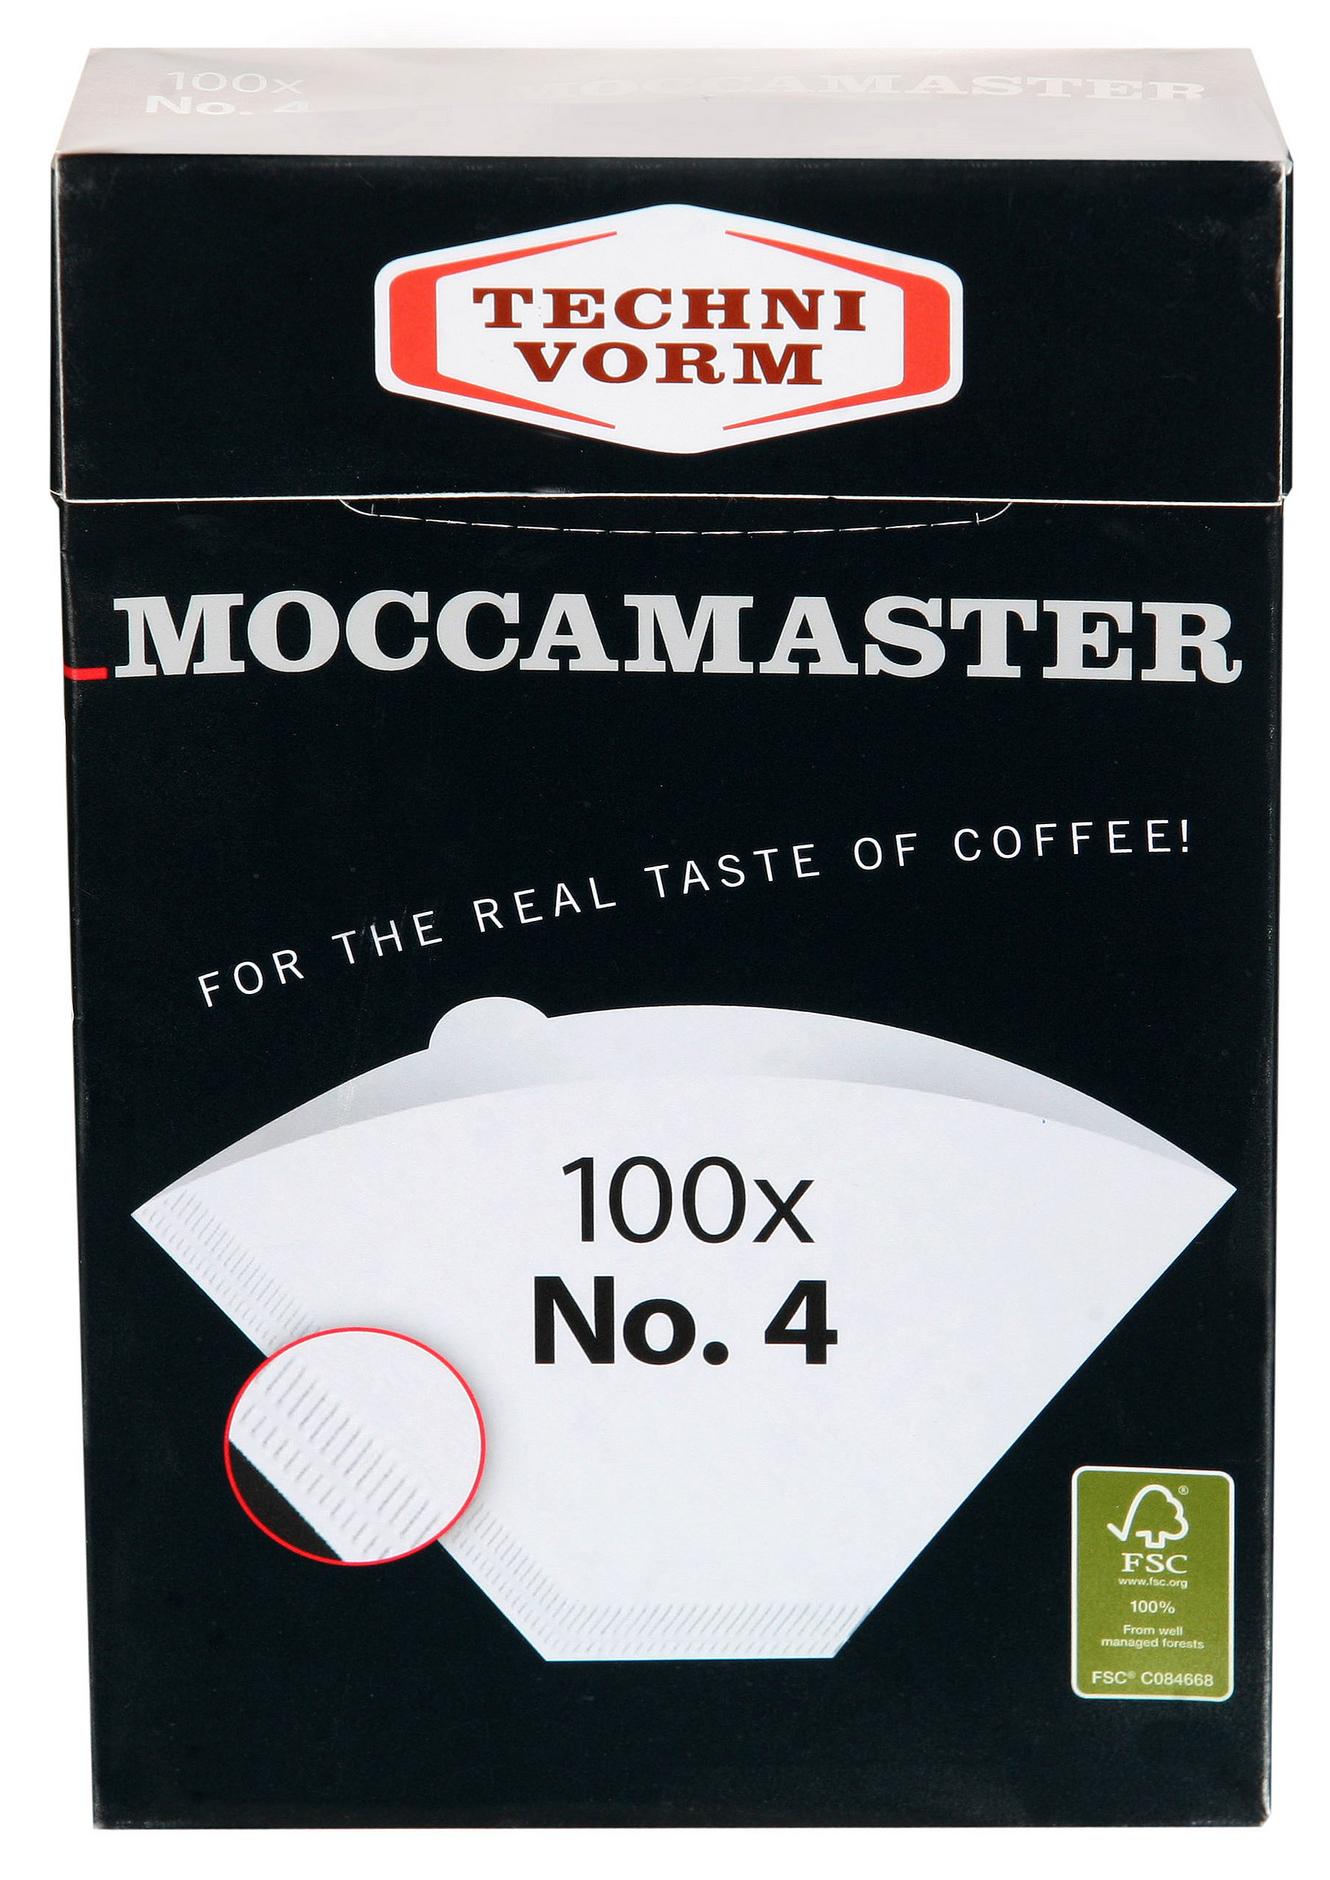 Moccamaster Kaffefilter storlek 1×4 100 st